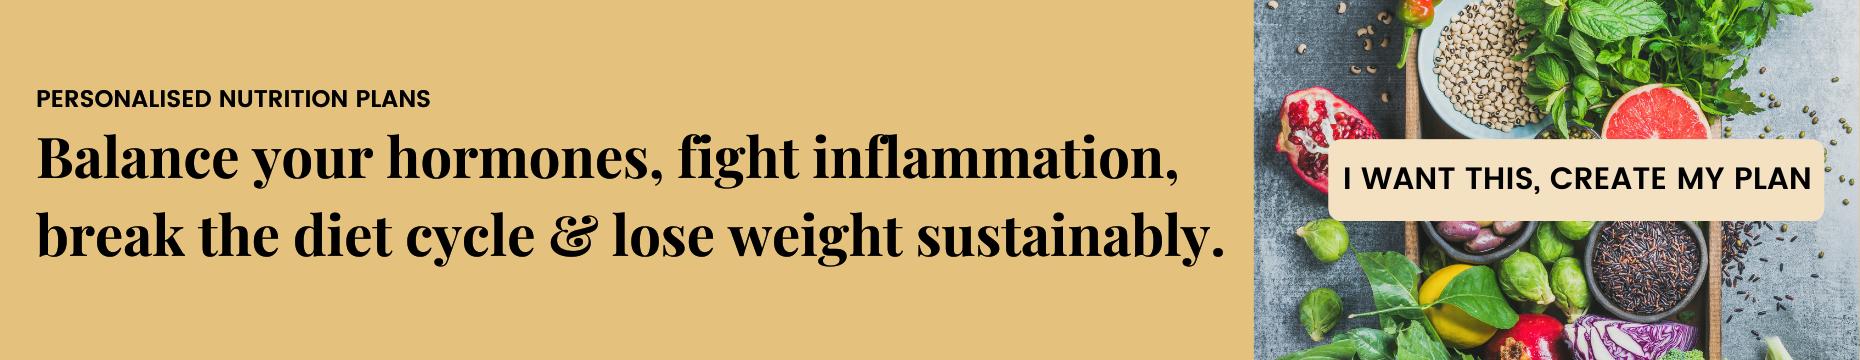 Promotion | Omisnutrition